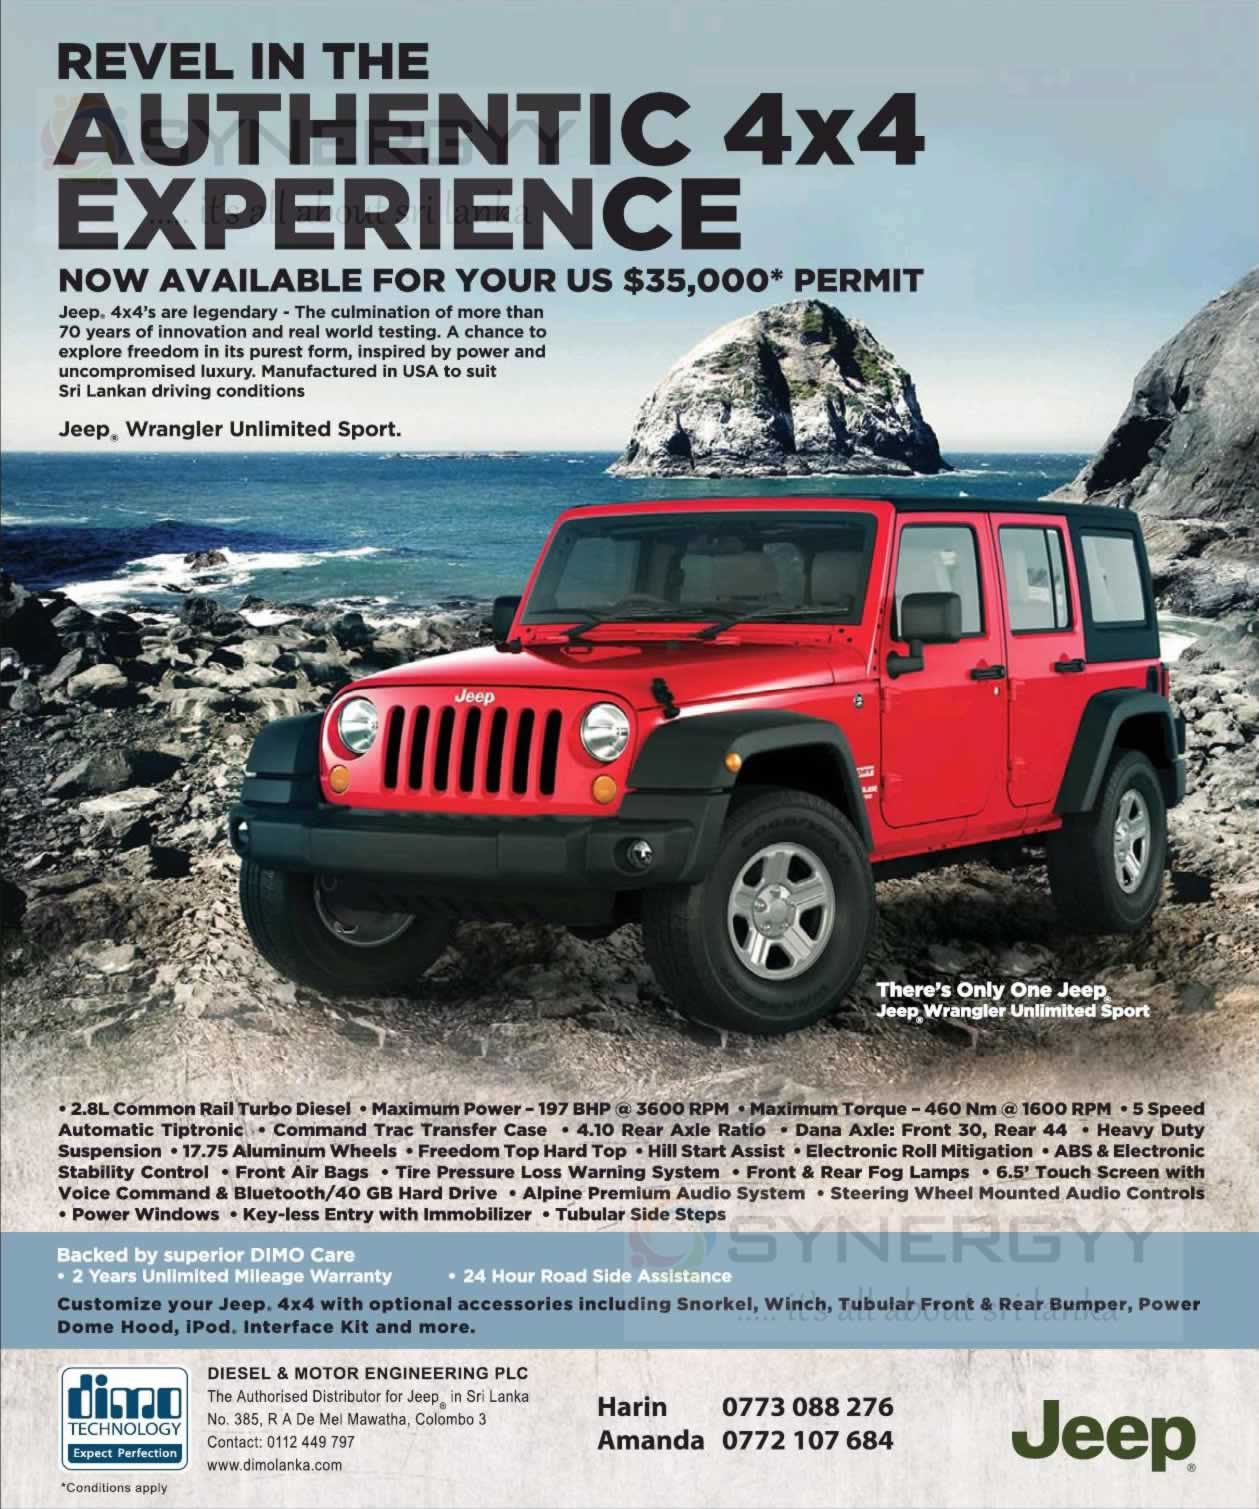 Price Of A Used Jeep Wrangler: Jeep Wrangler Unlimited Sport 4X4 Prices In Sri Lanka